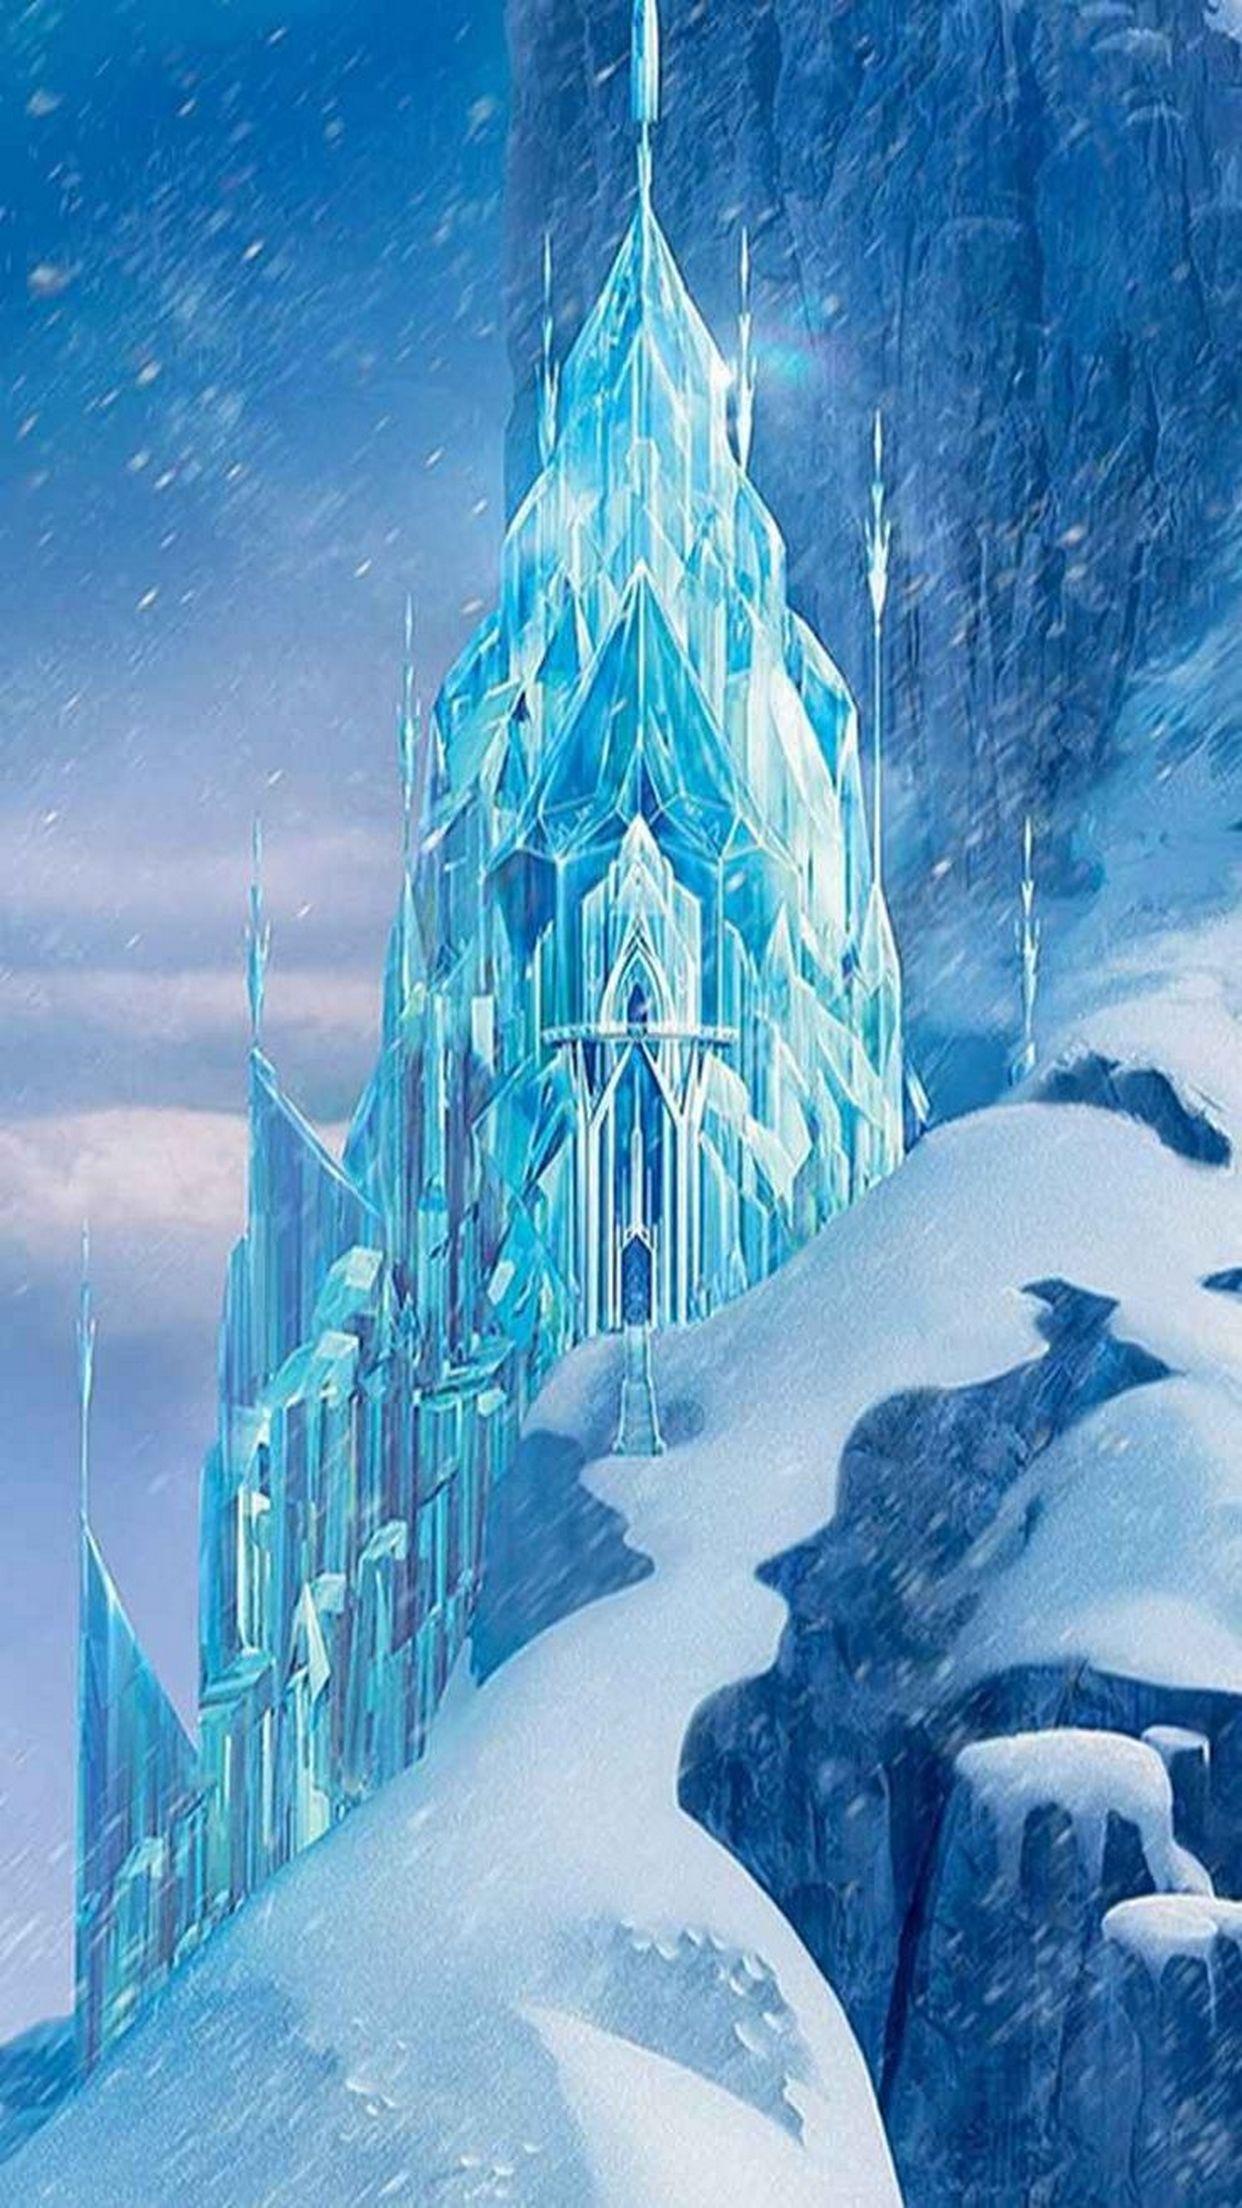 iPhone wallpaper 15 Frozen castle, Frozen disney movie